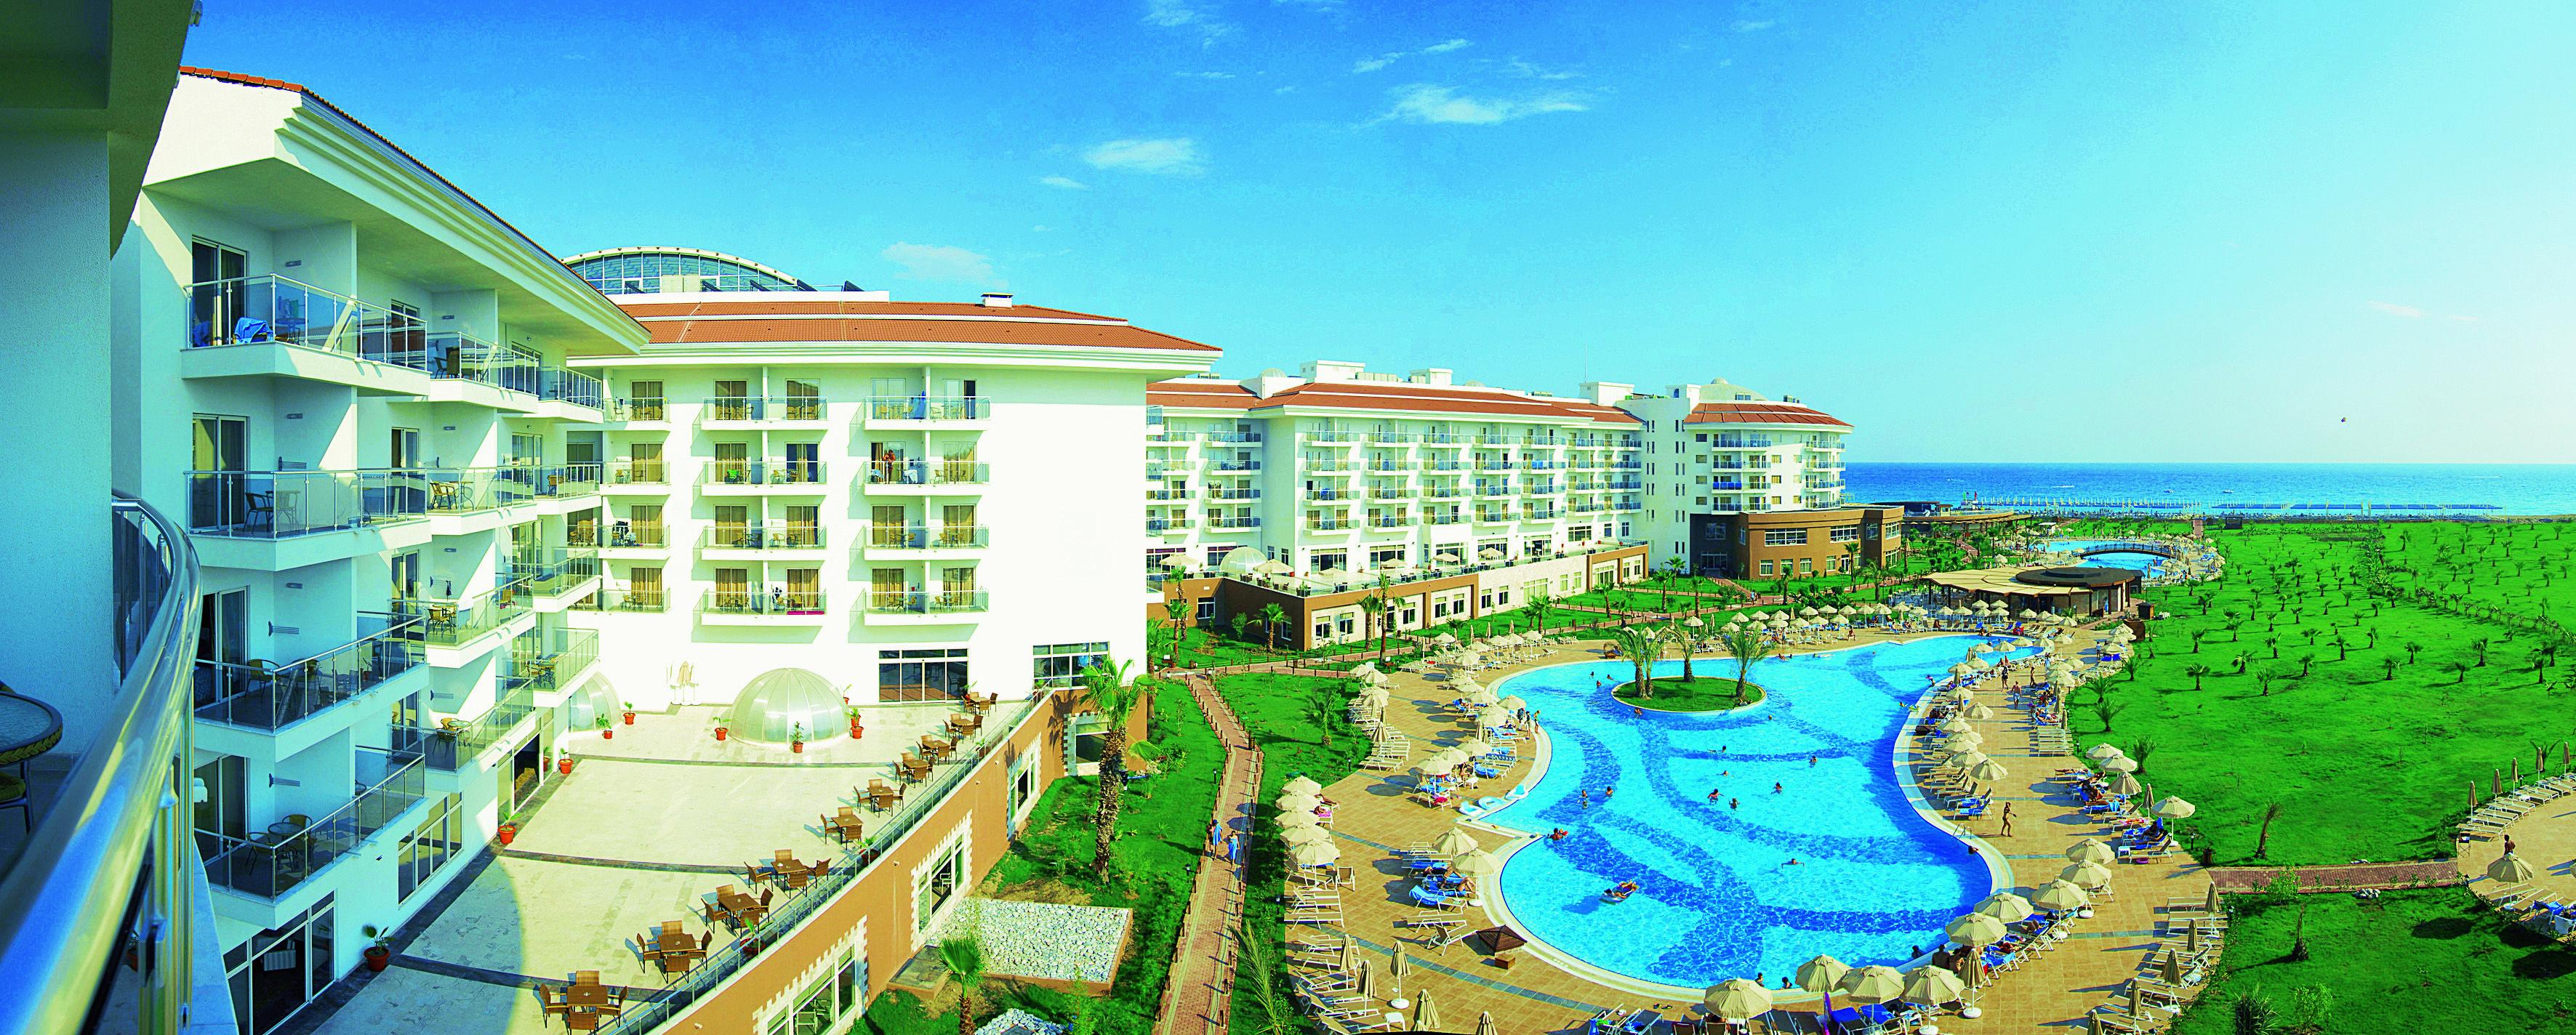 Over 500 rooms | SunConnect Sea World Resort & Spa | Pinterest ...